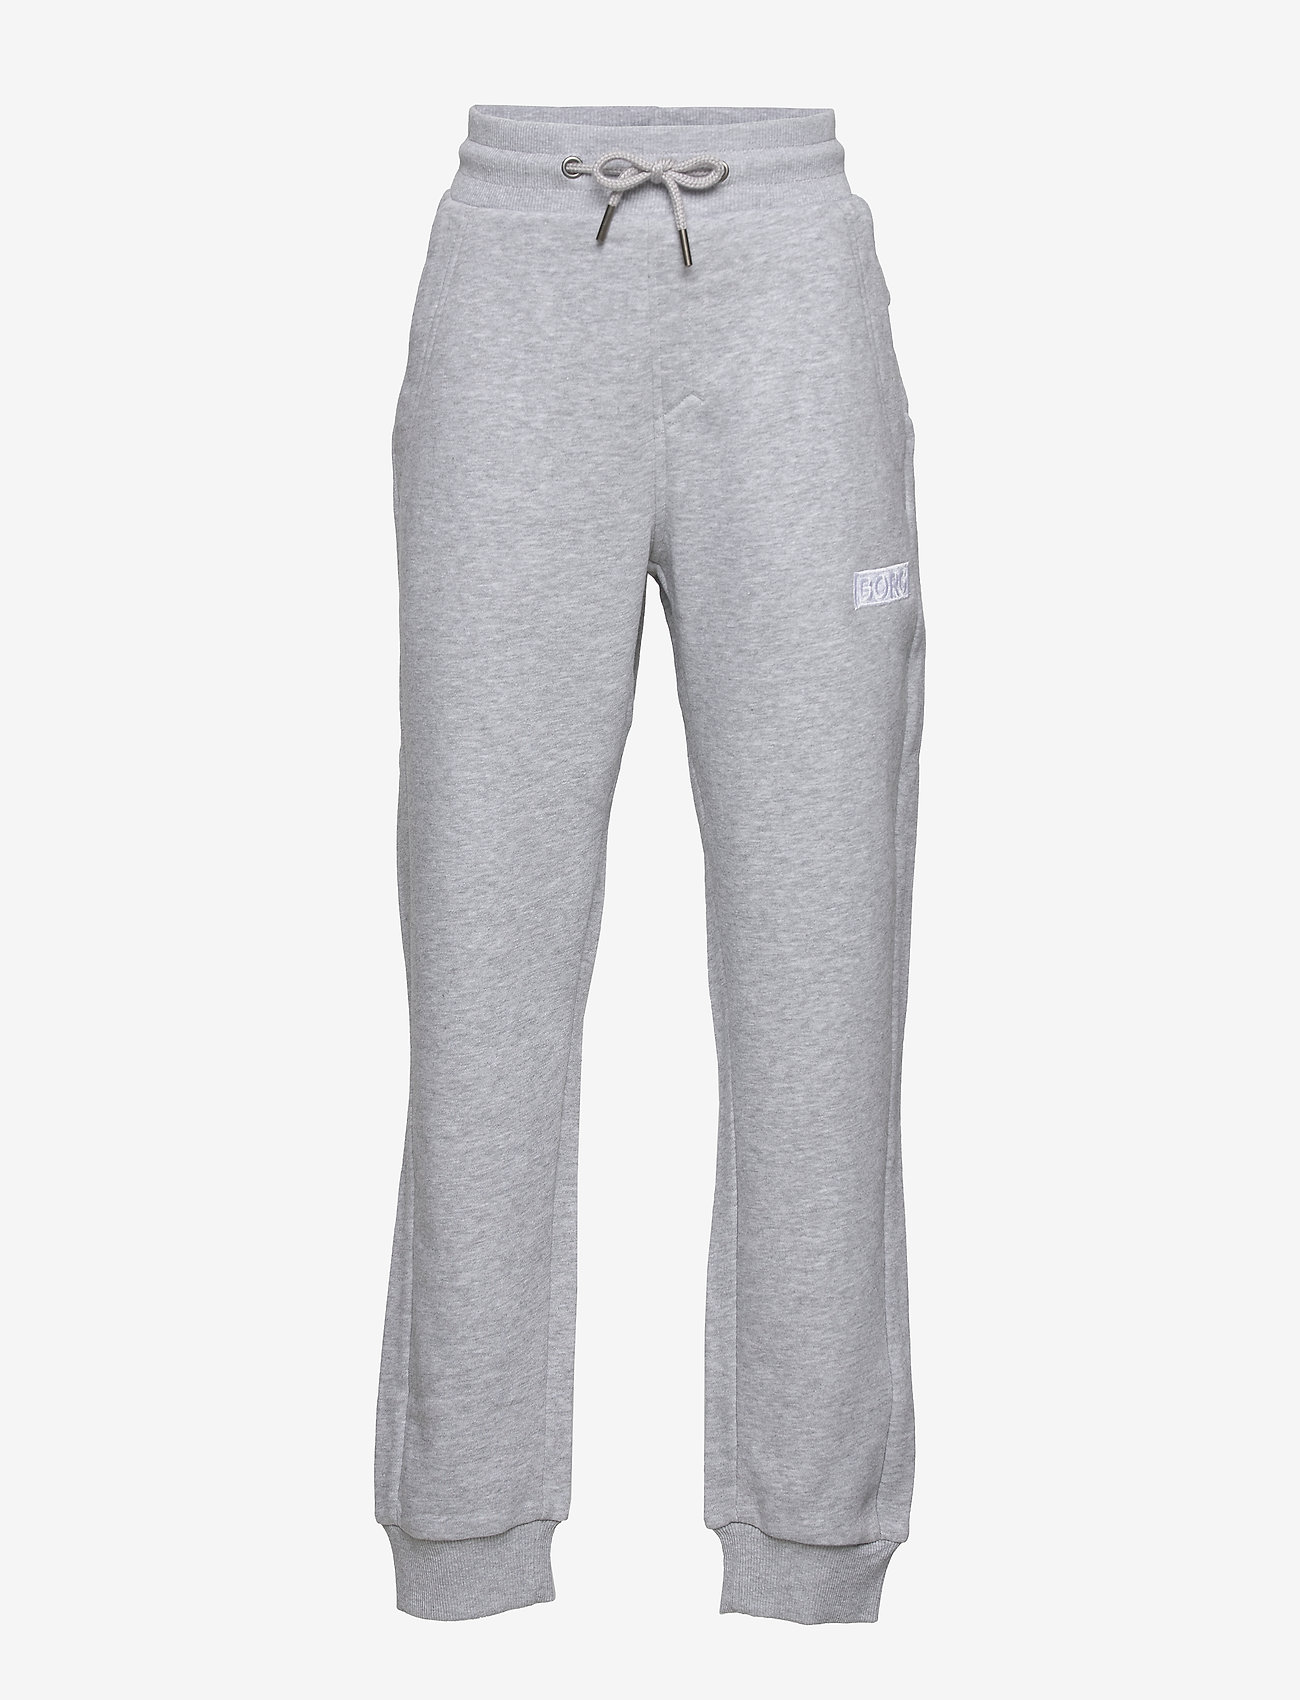 Björn Borg - BORG SPORT PANTS - sweatpants - h108by light grey melange